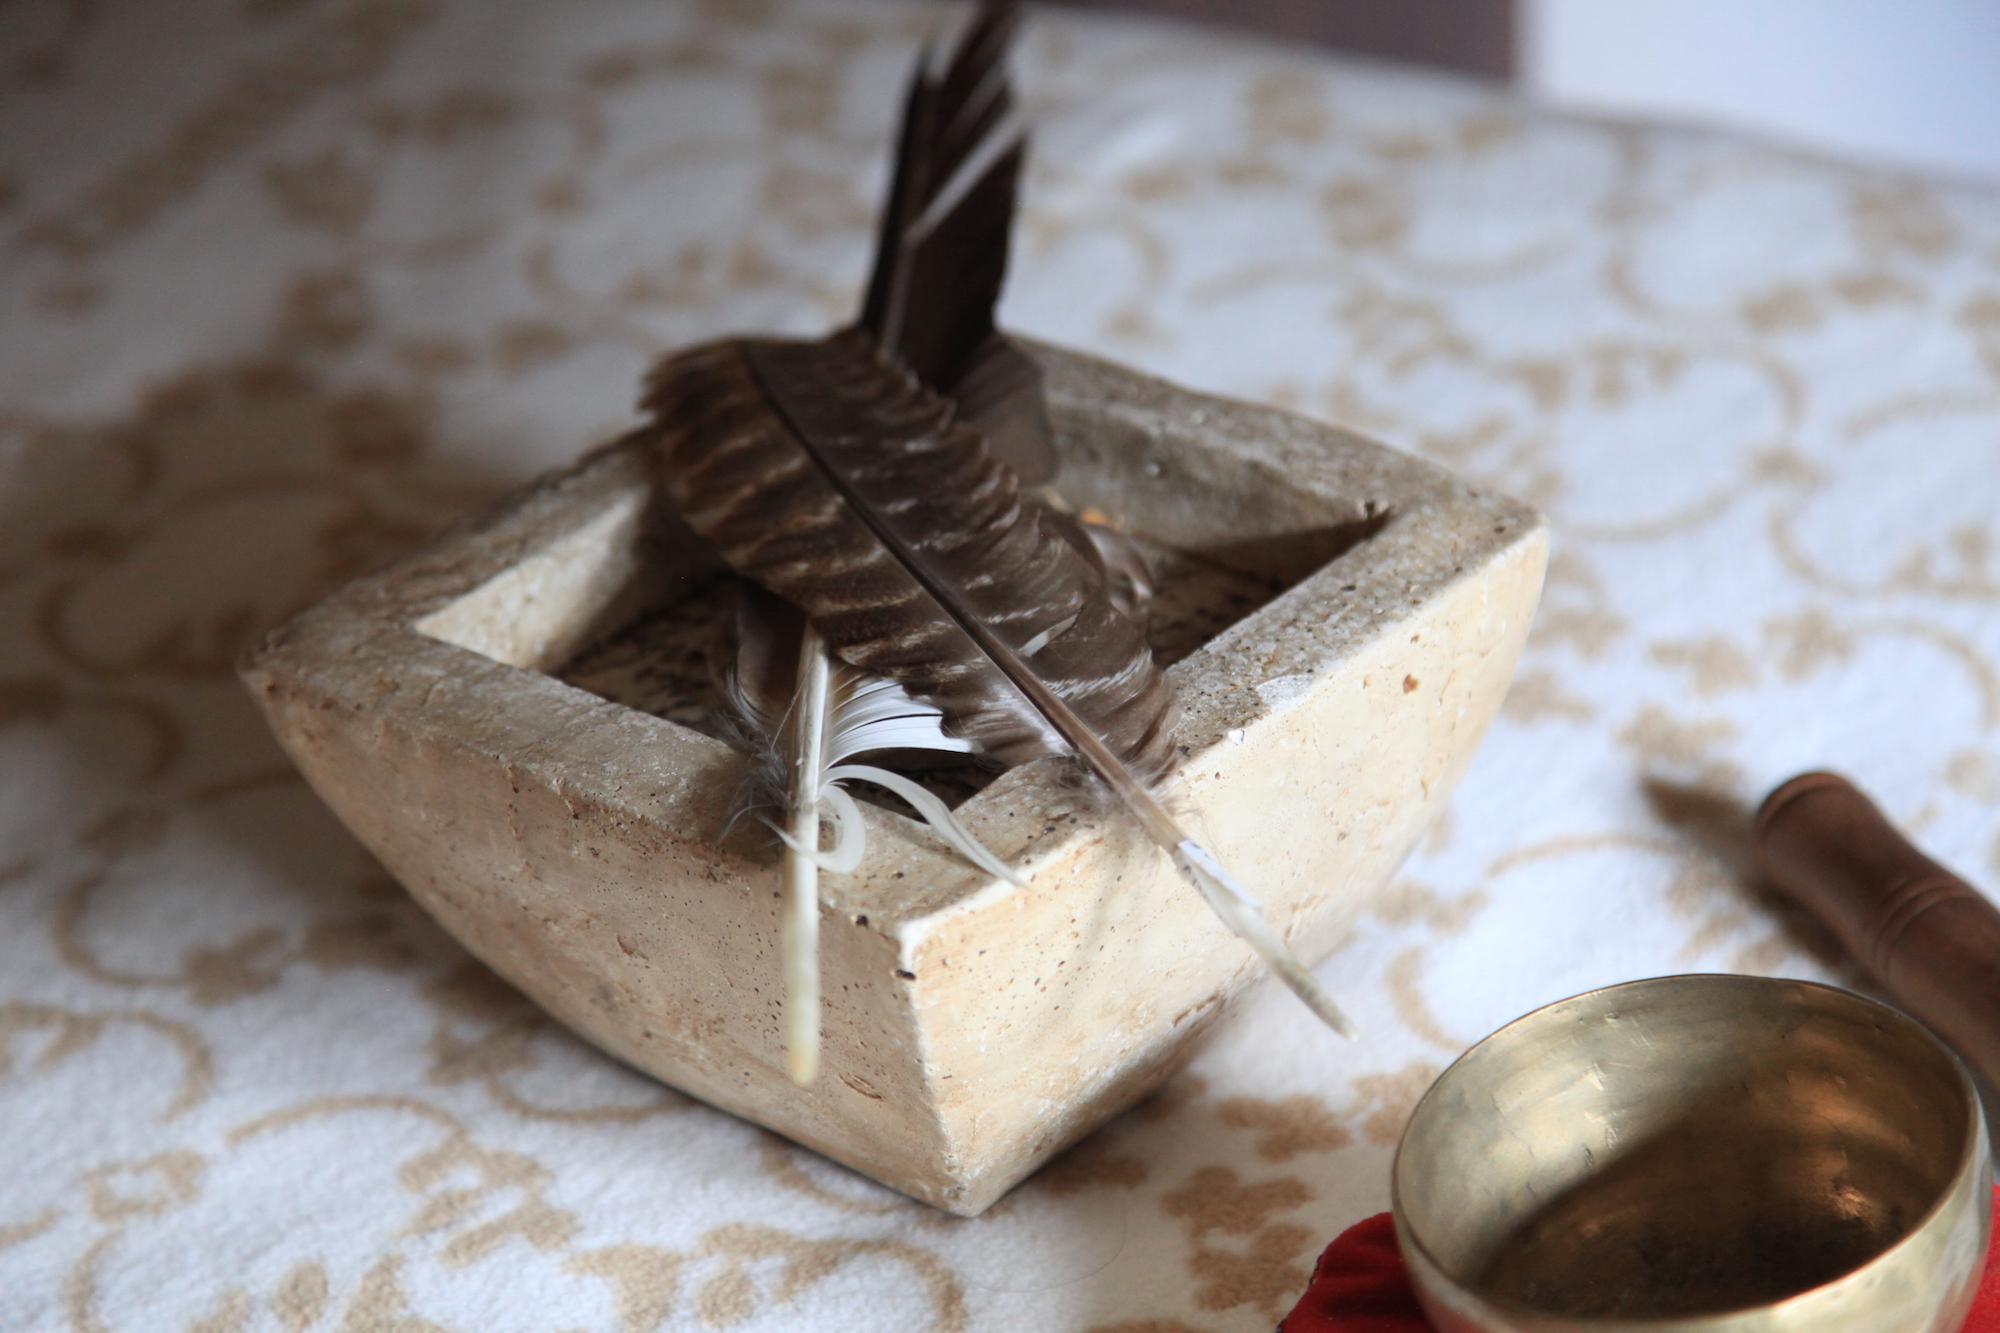 Naturschamane_Feng_Shui_Samanische_Seminare_Spirituelles_Coaching_Essenzen_Meditationen_Vasnaro_50.jpg